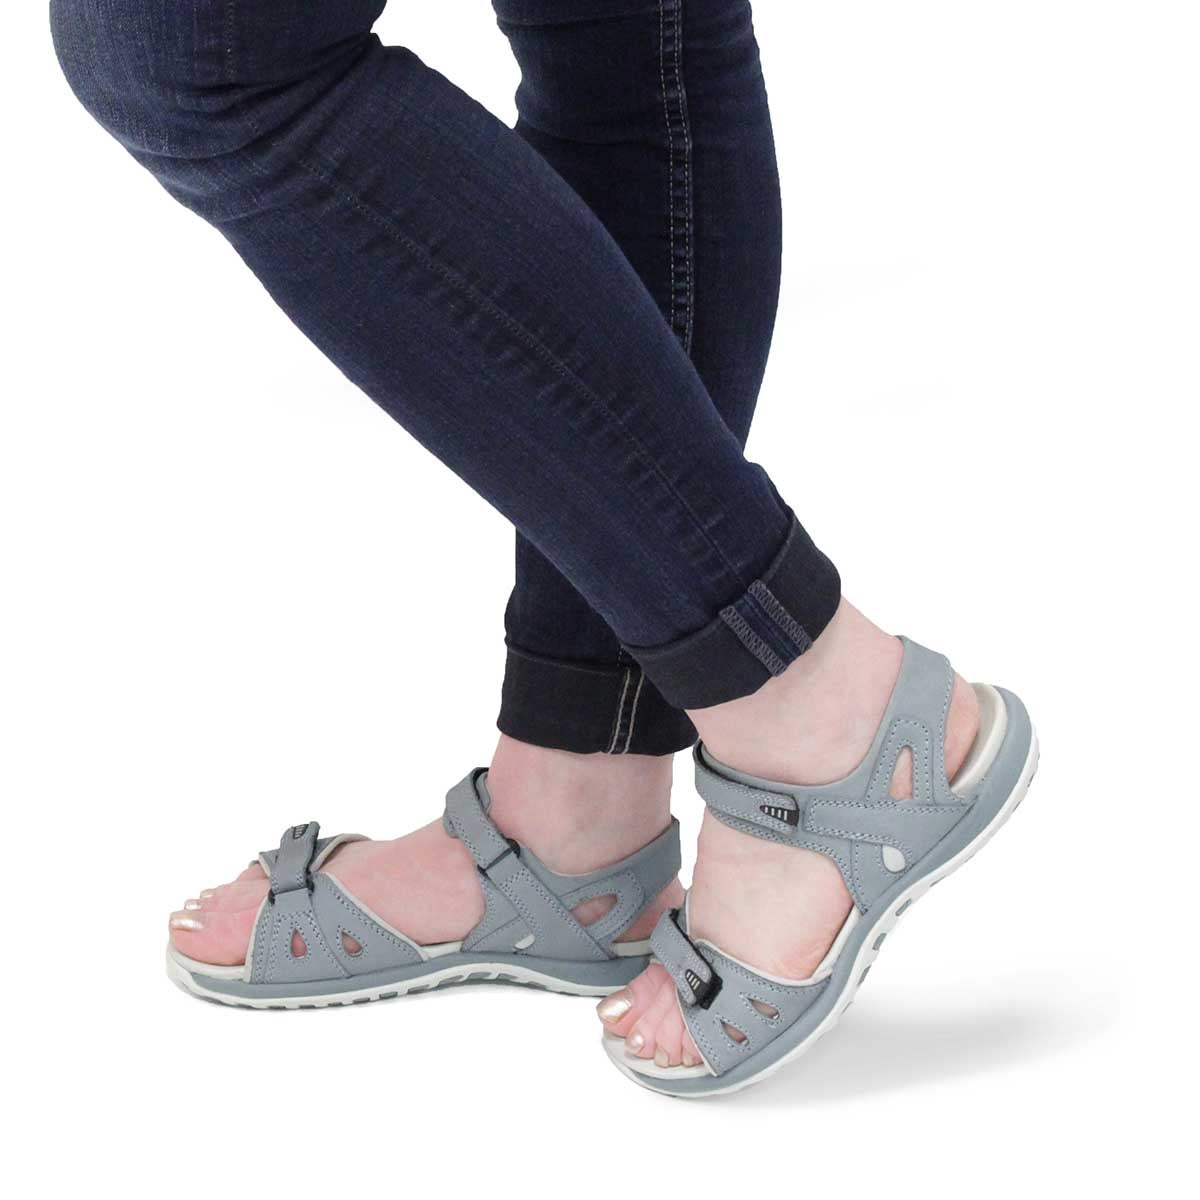 Lds Caley 3 blue 3 strap sport sandal